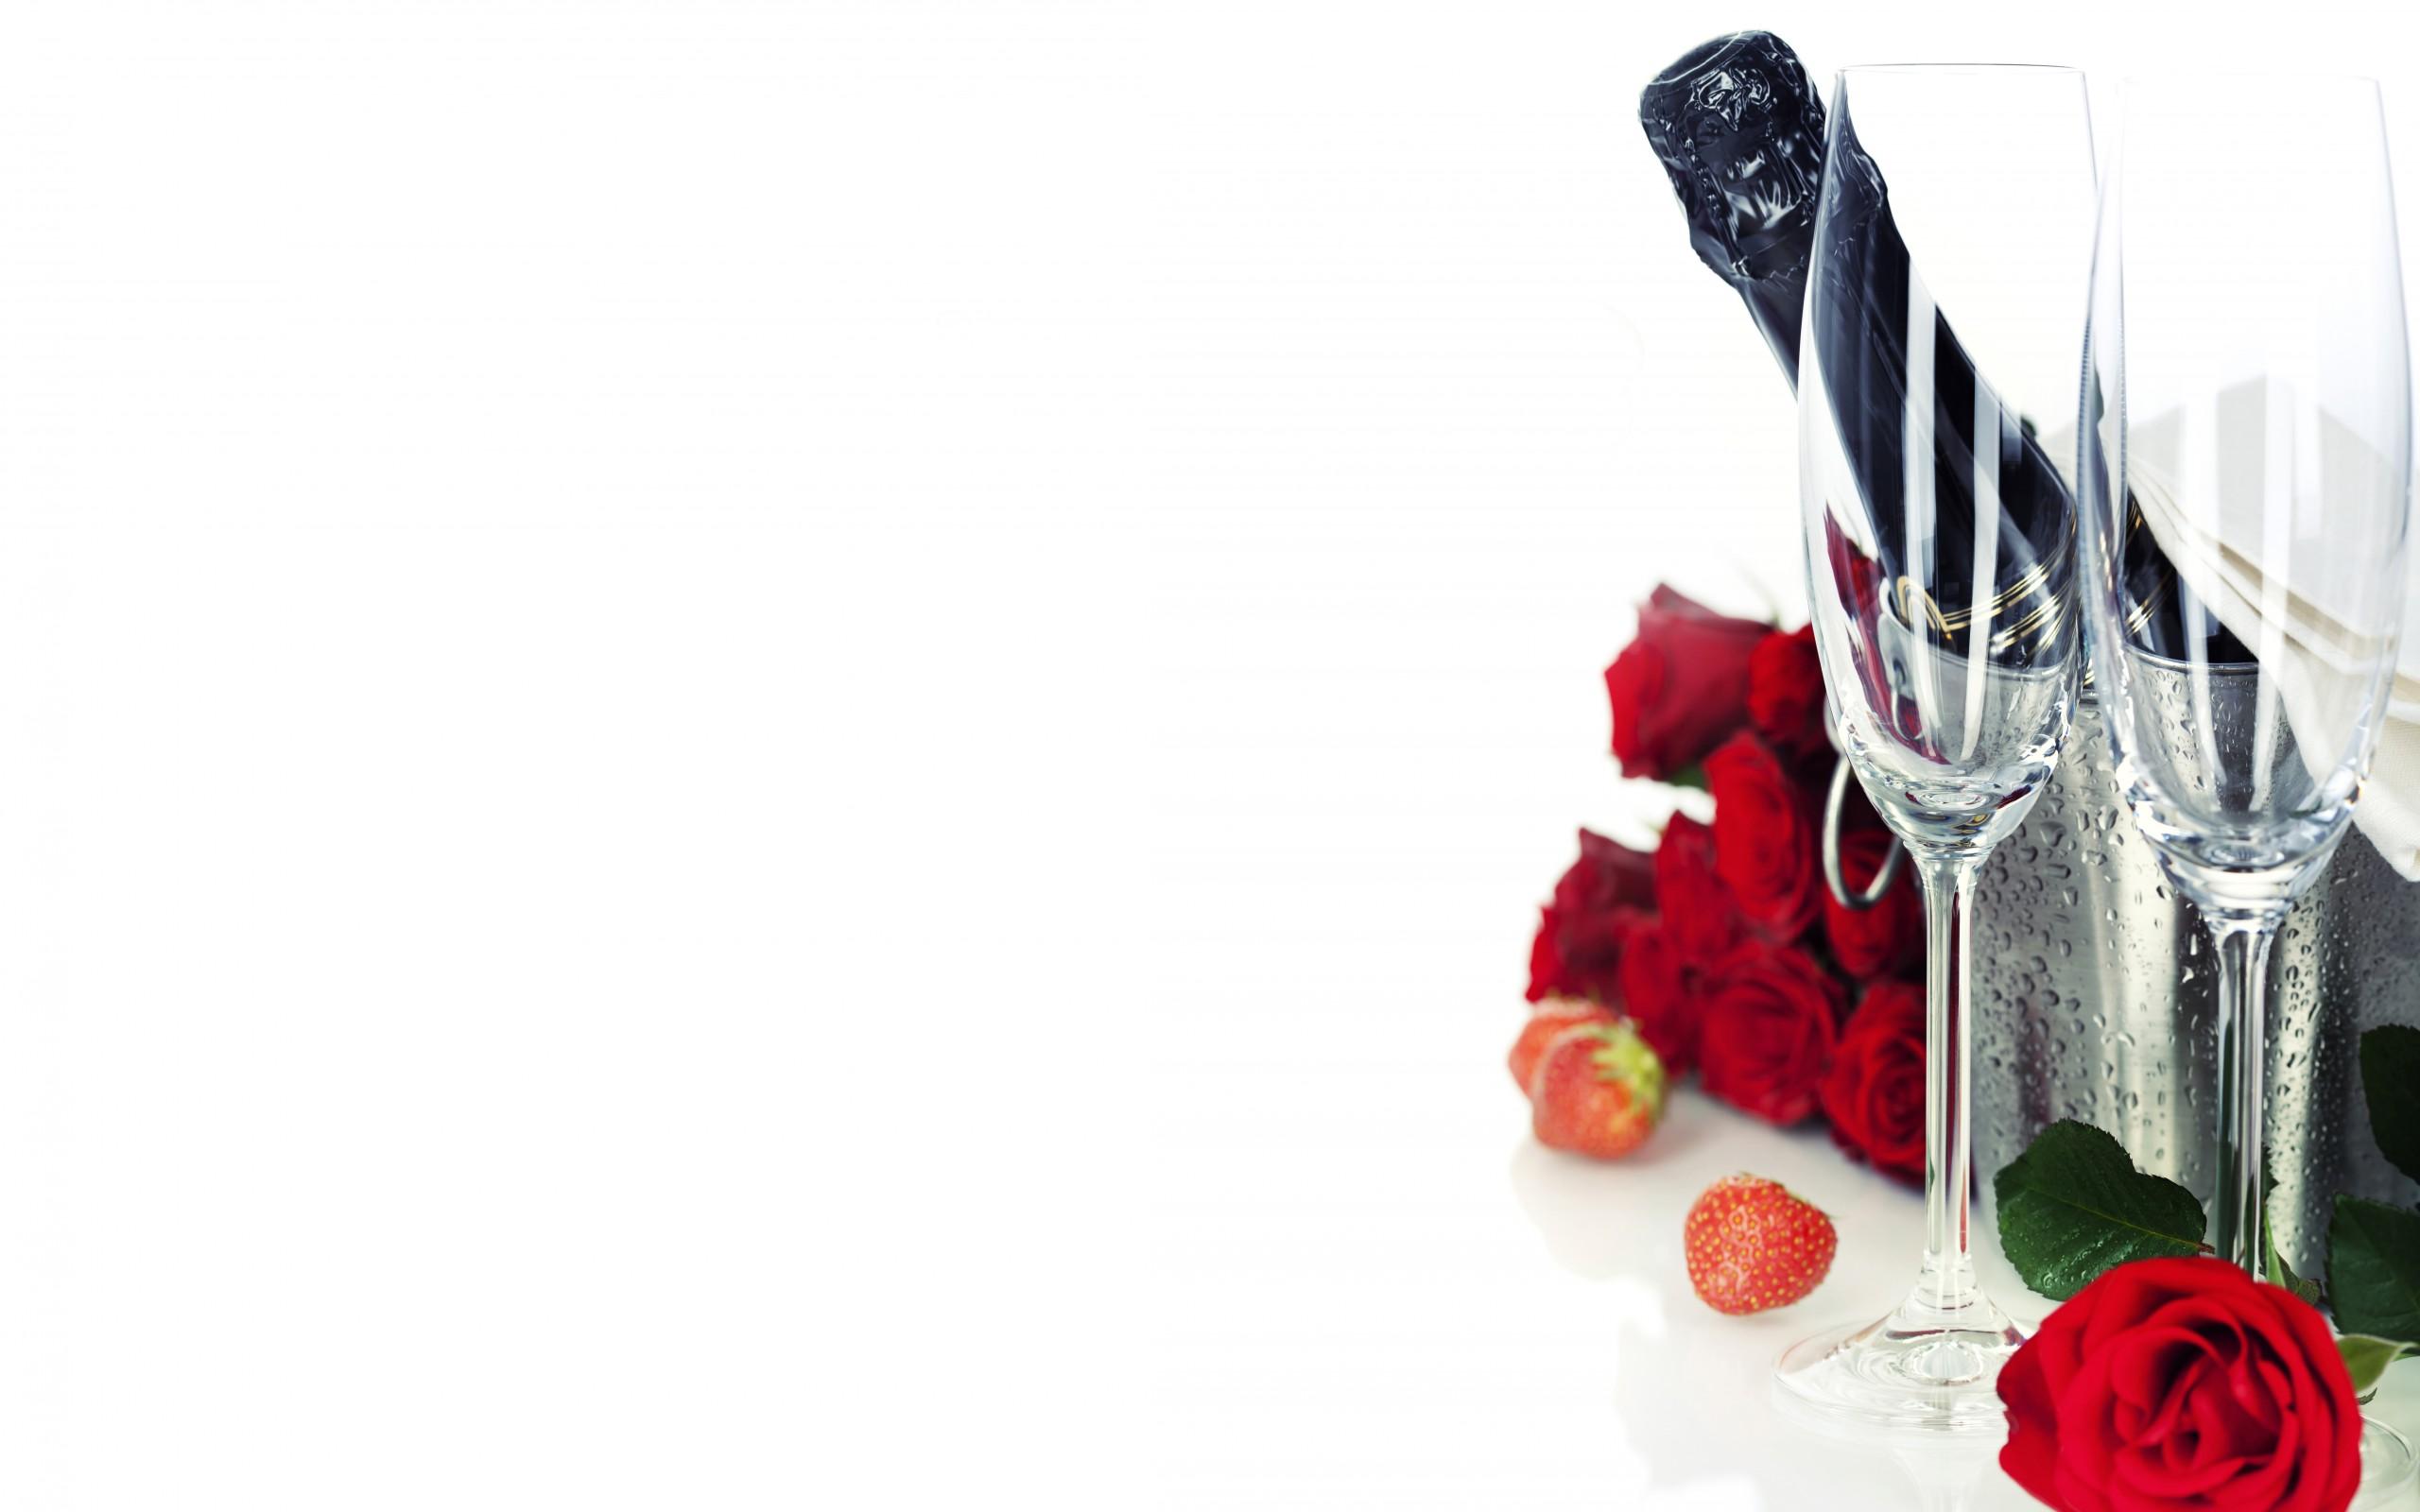 Вино - Wine 2 (65 обоев) » Смотри Красивые ...: lookw.ru/eda/page,2,169-vino-wine-2-65-oboev.html